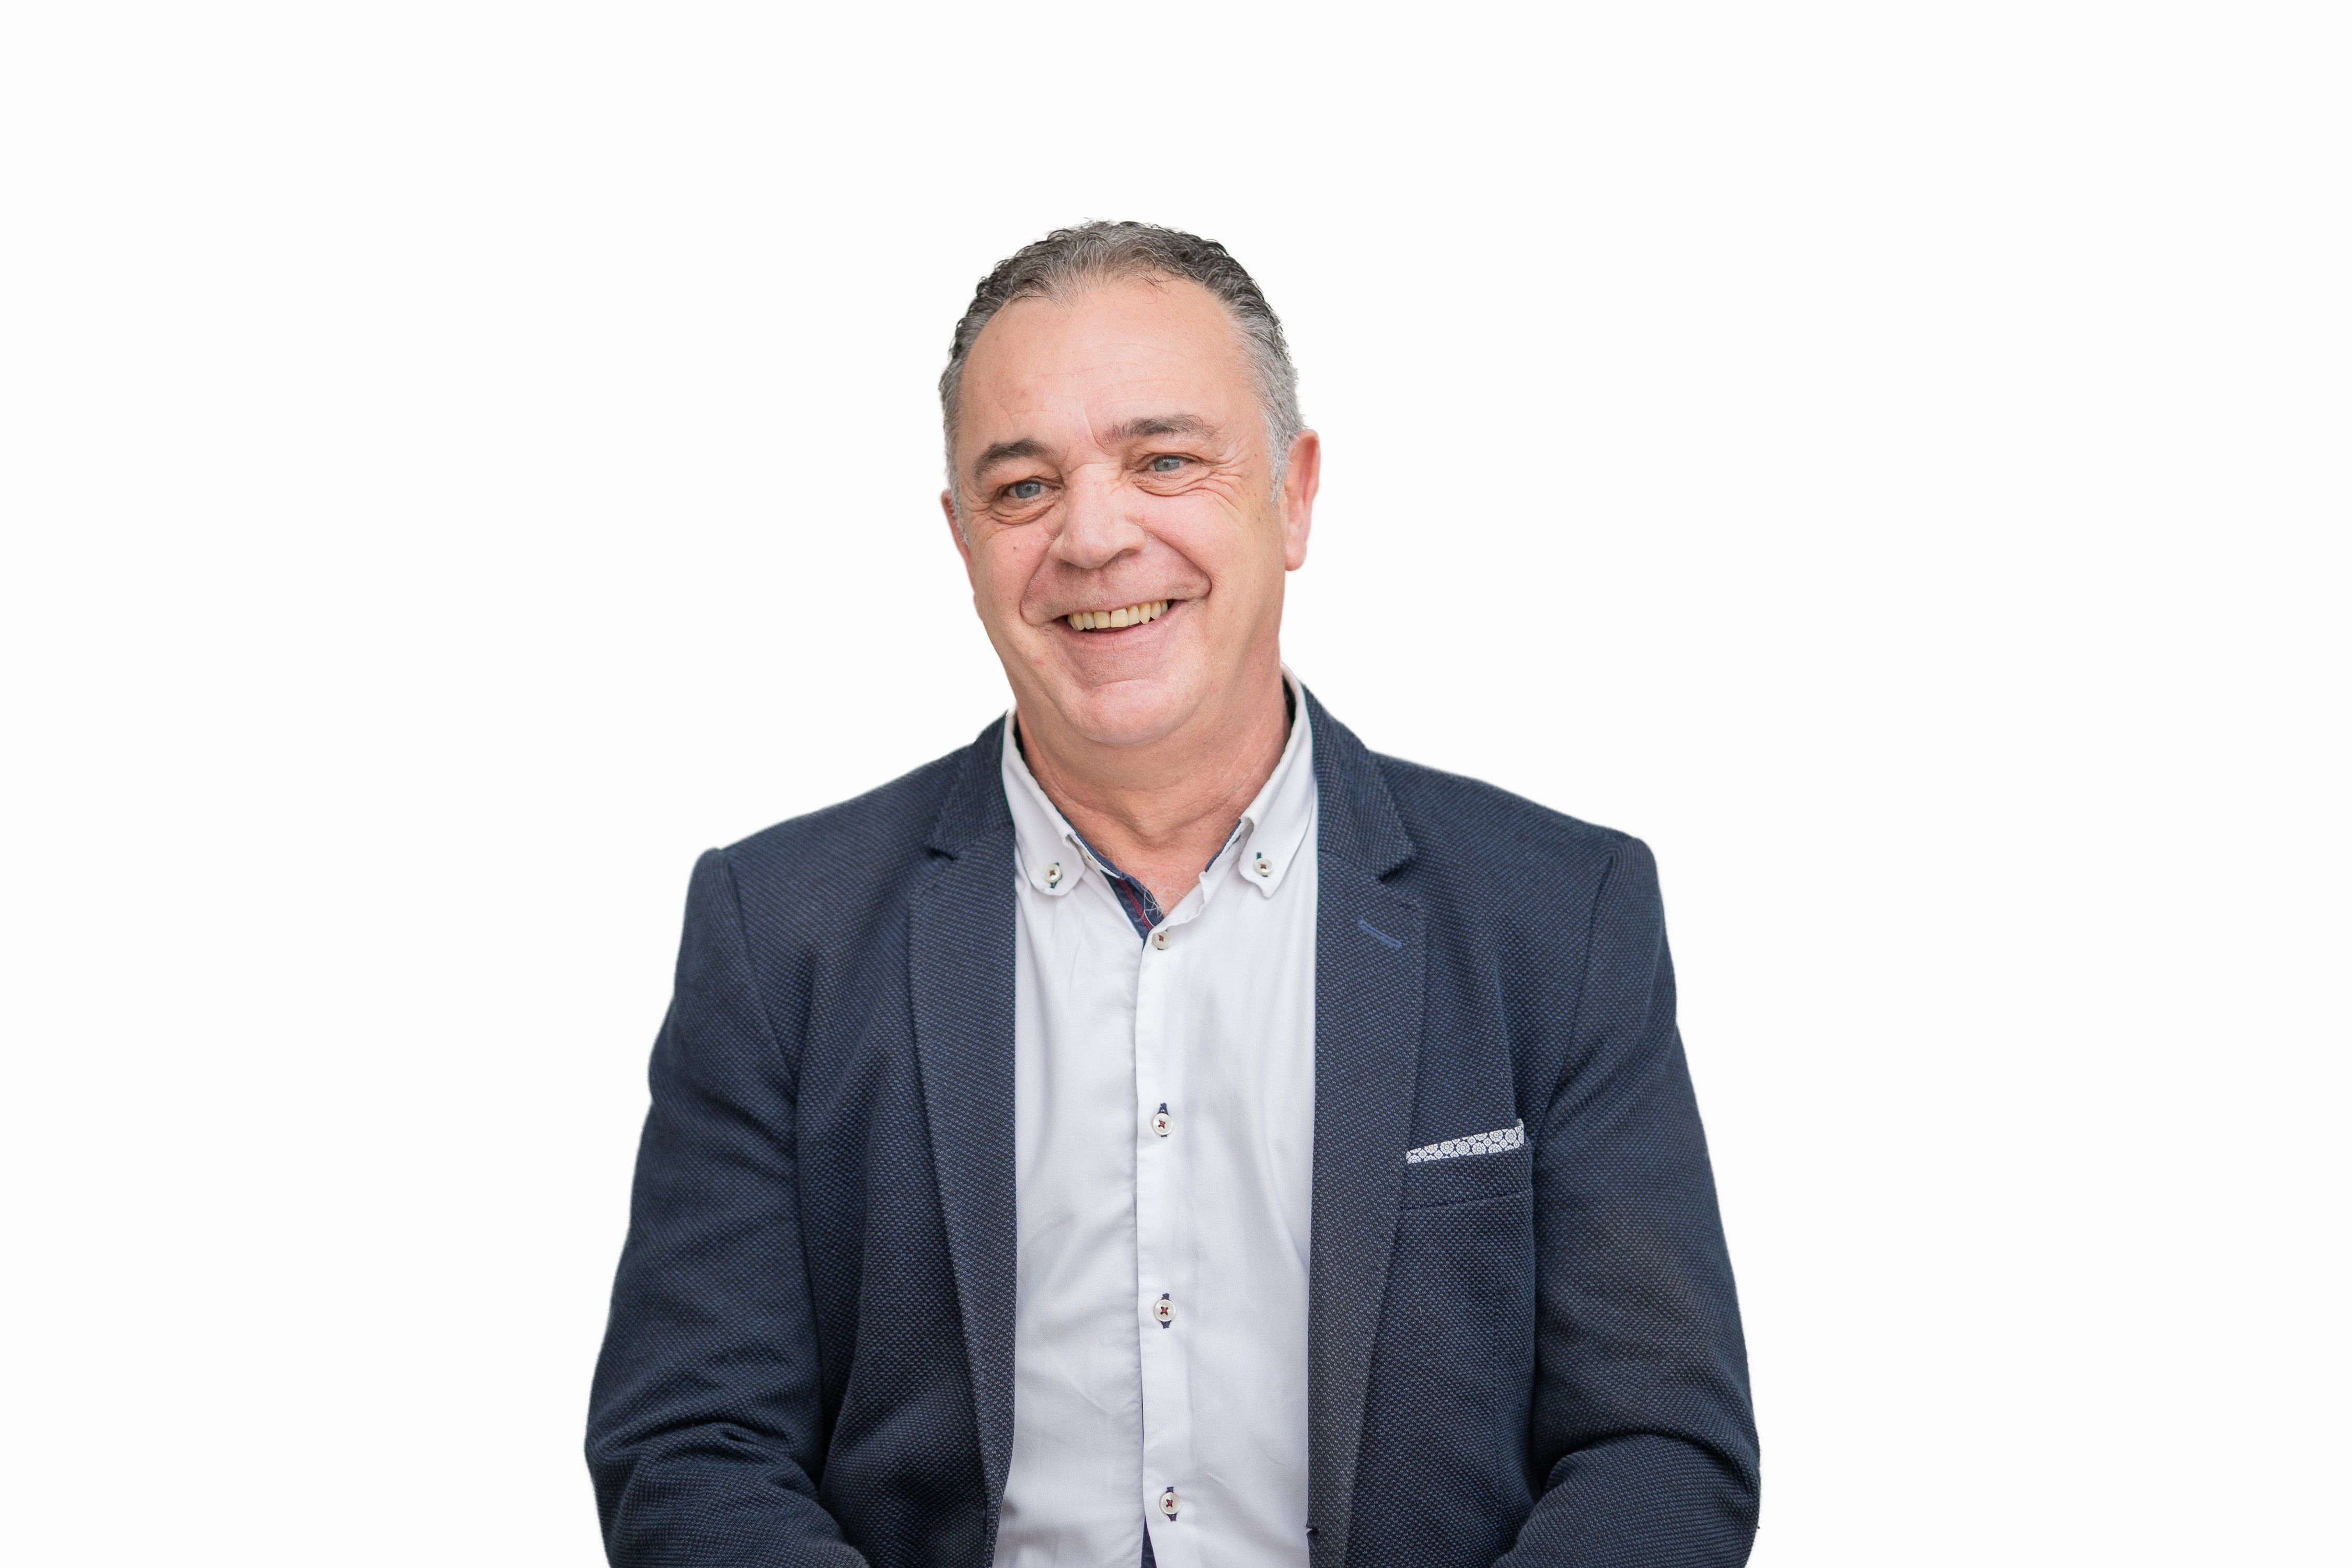 Carlos Iglesias Rodríguez